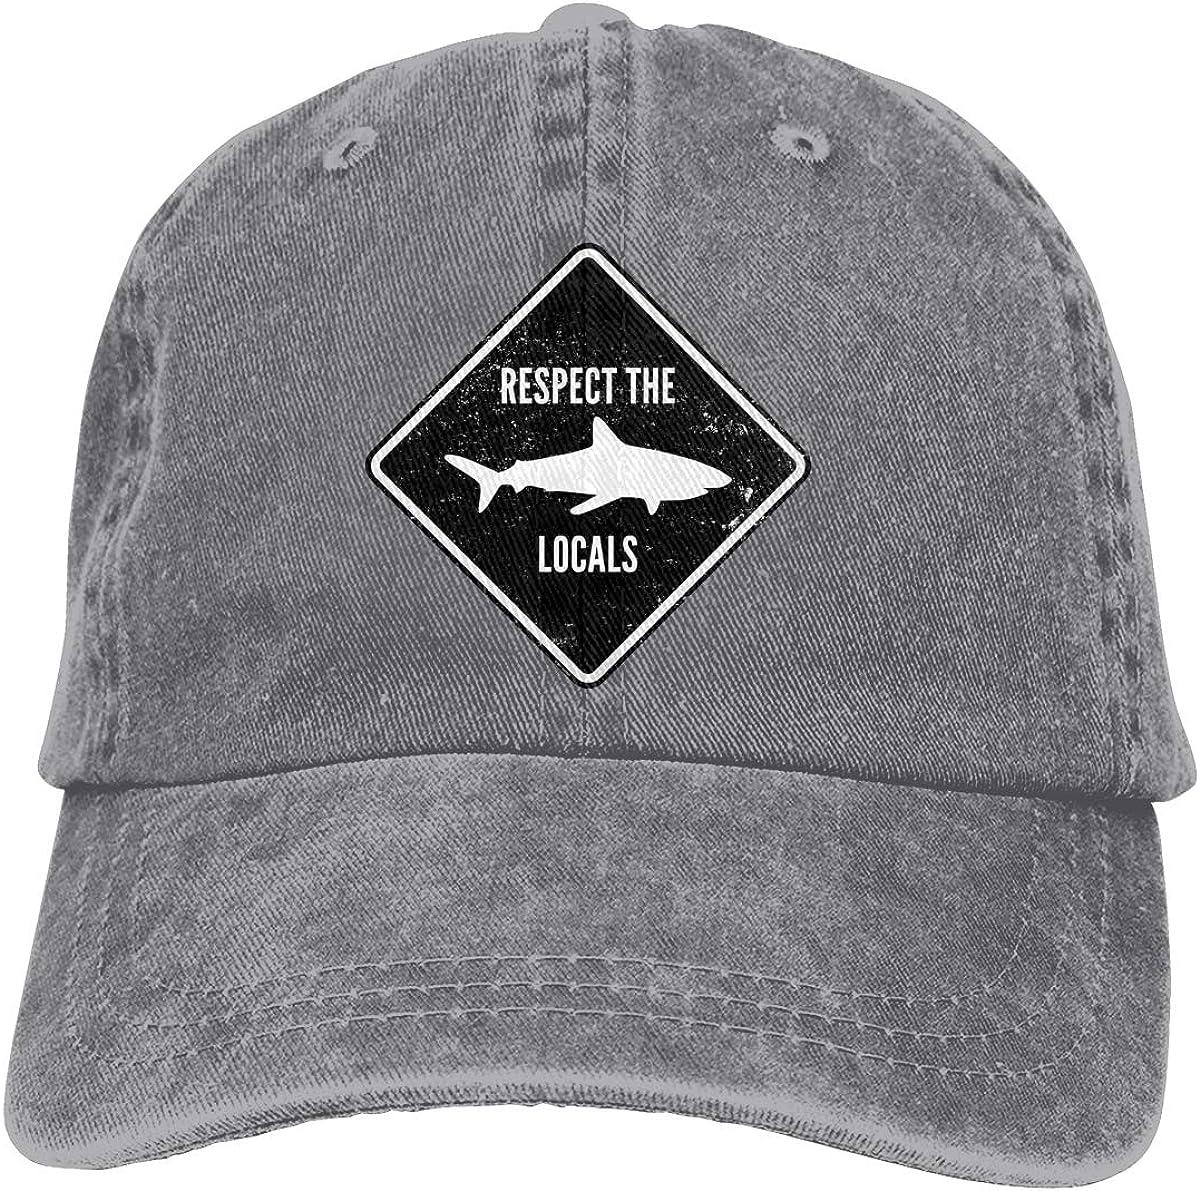 Decopik Hella Loud Baseball Cap Cotton Washed Distressed Dad Hats